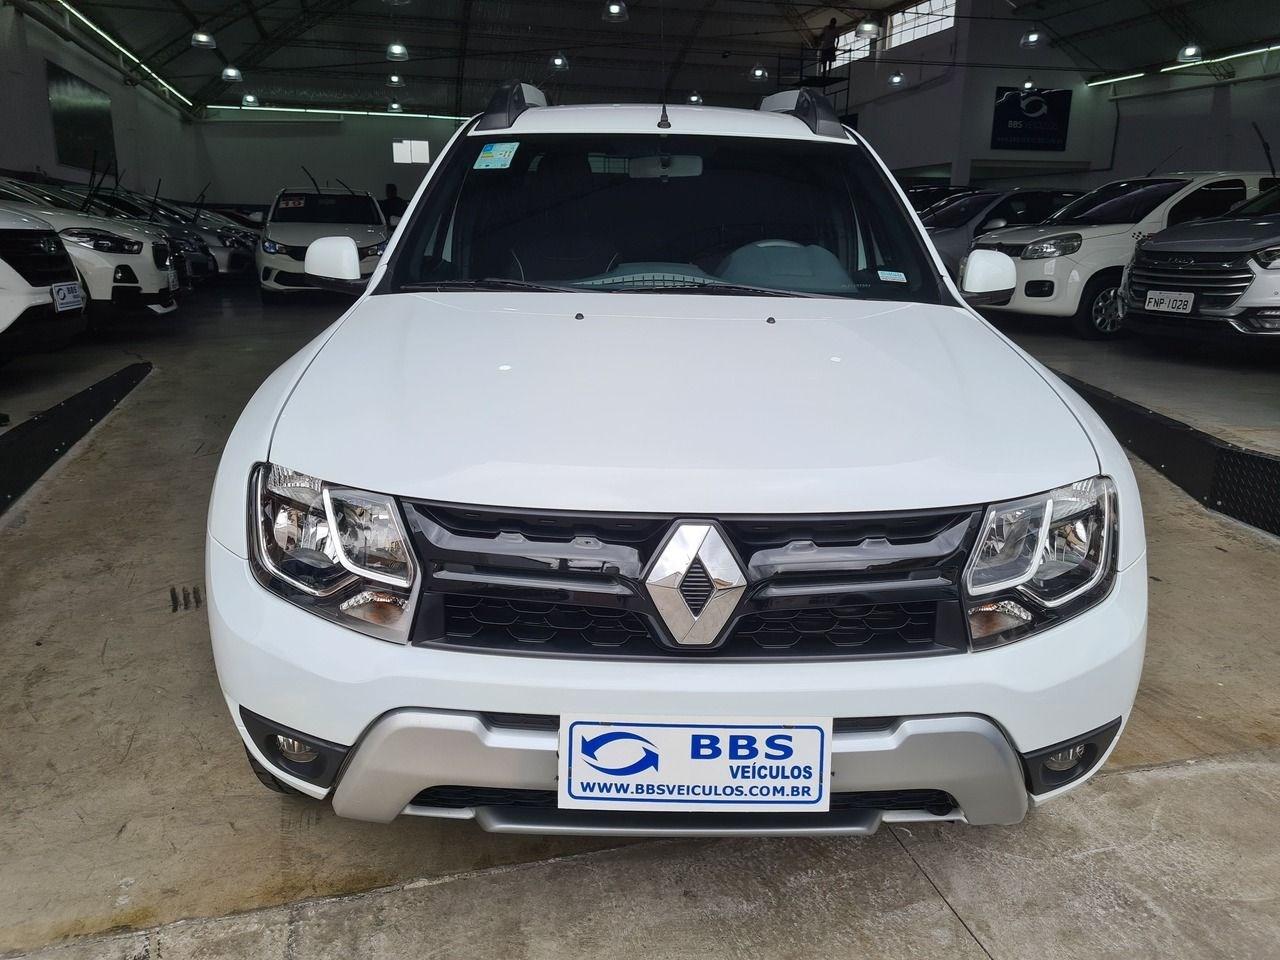 //www.autoline.com.br/carro/renault/duster-oroch-16-dynamique-16v-flex-4p-manual/2020/sao-paulo-sp/13512420